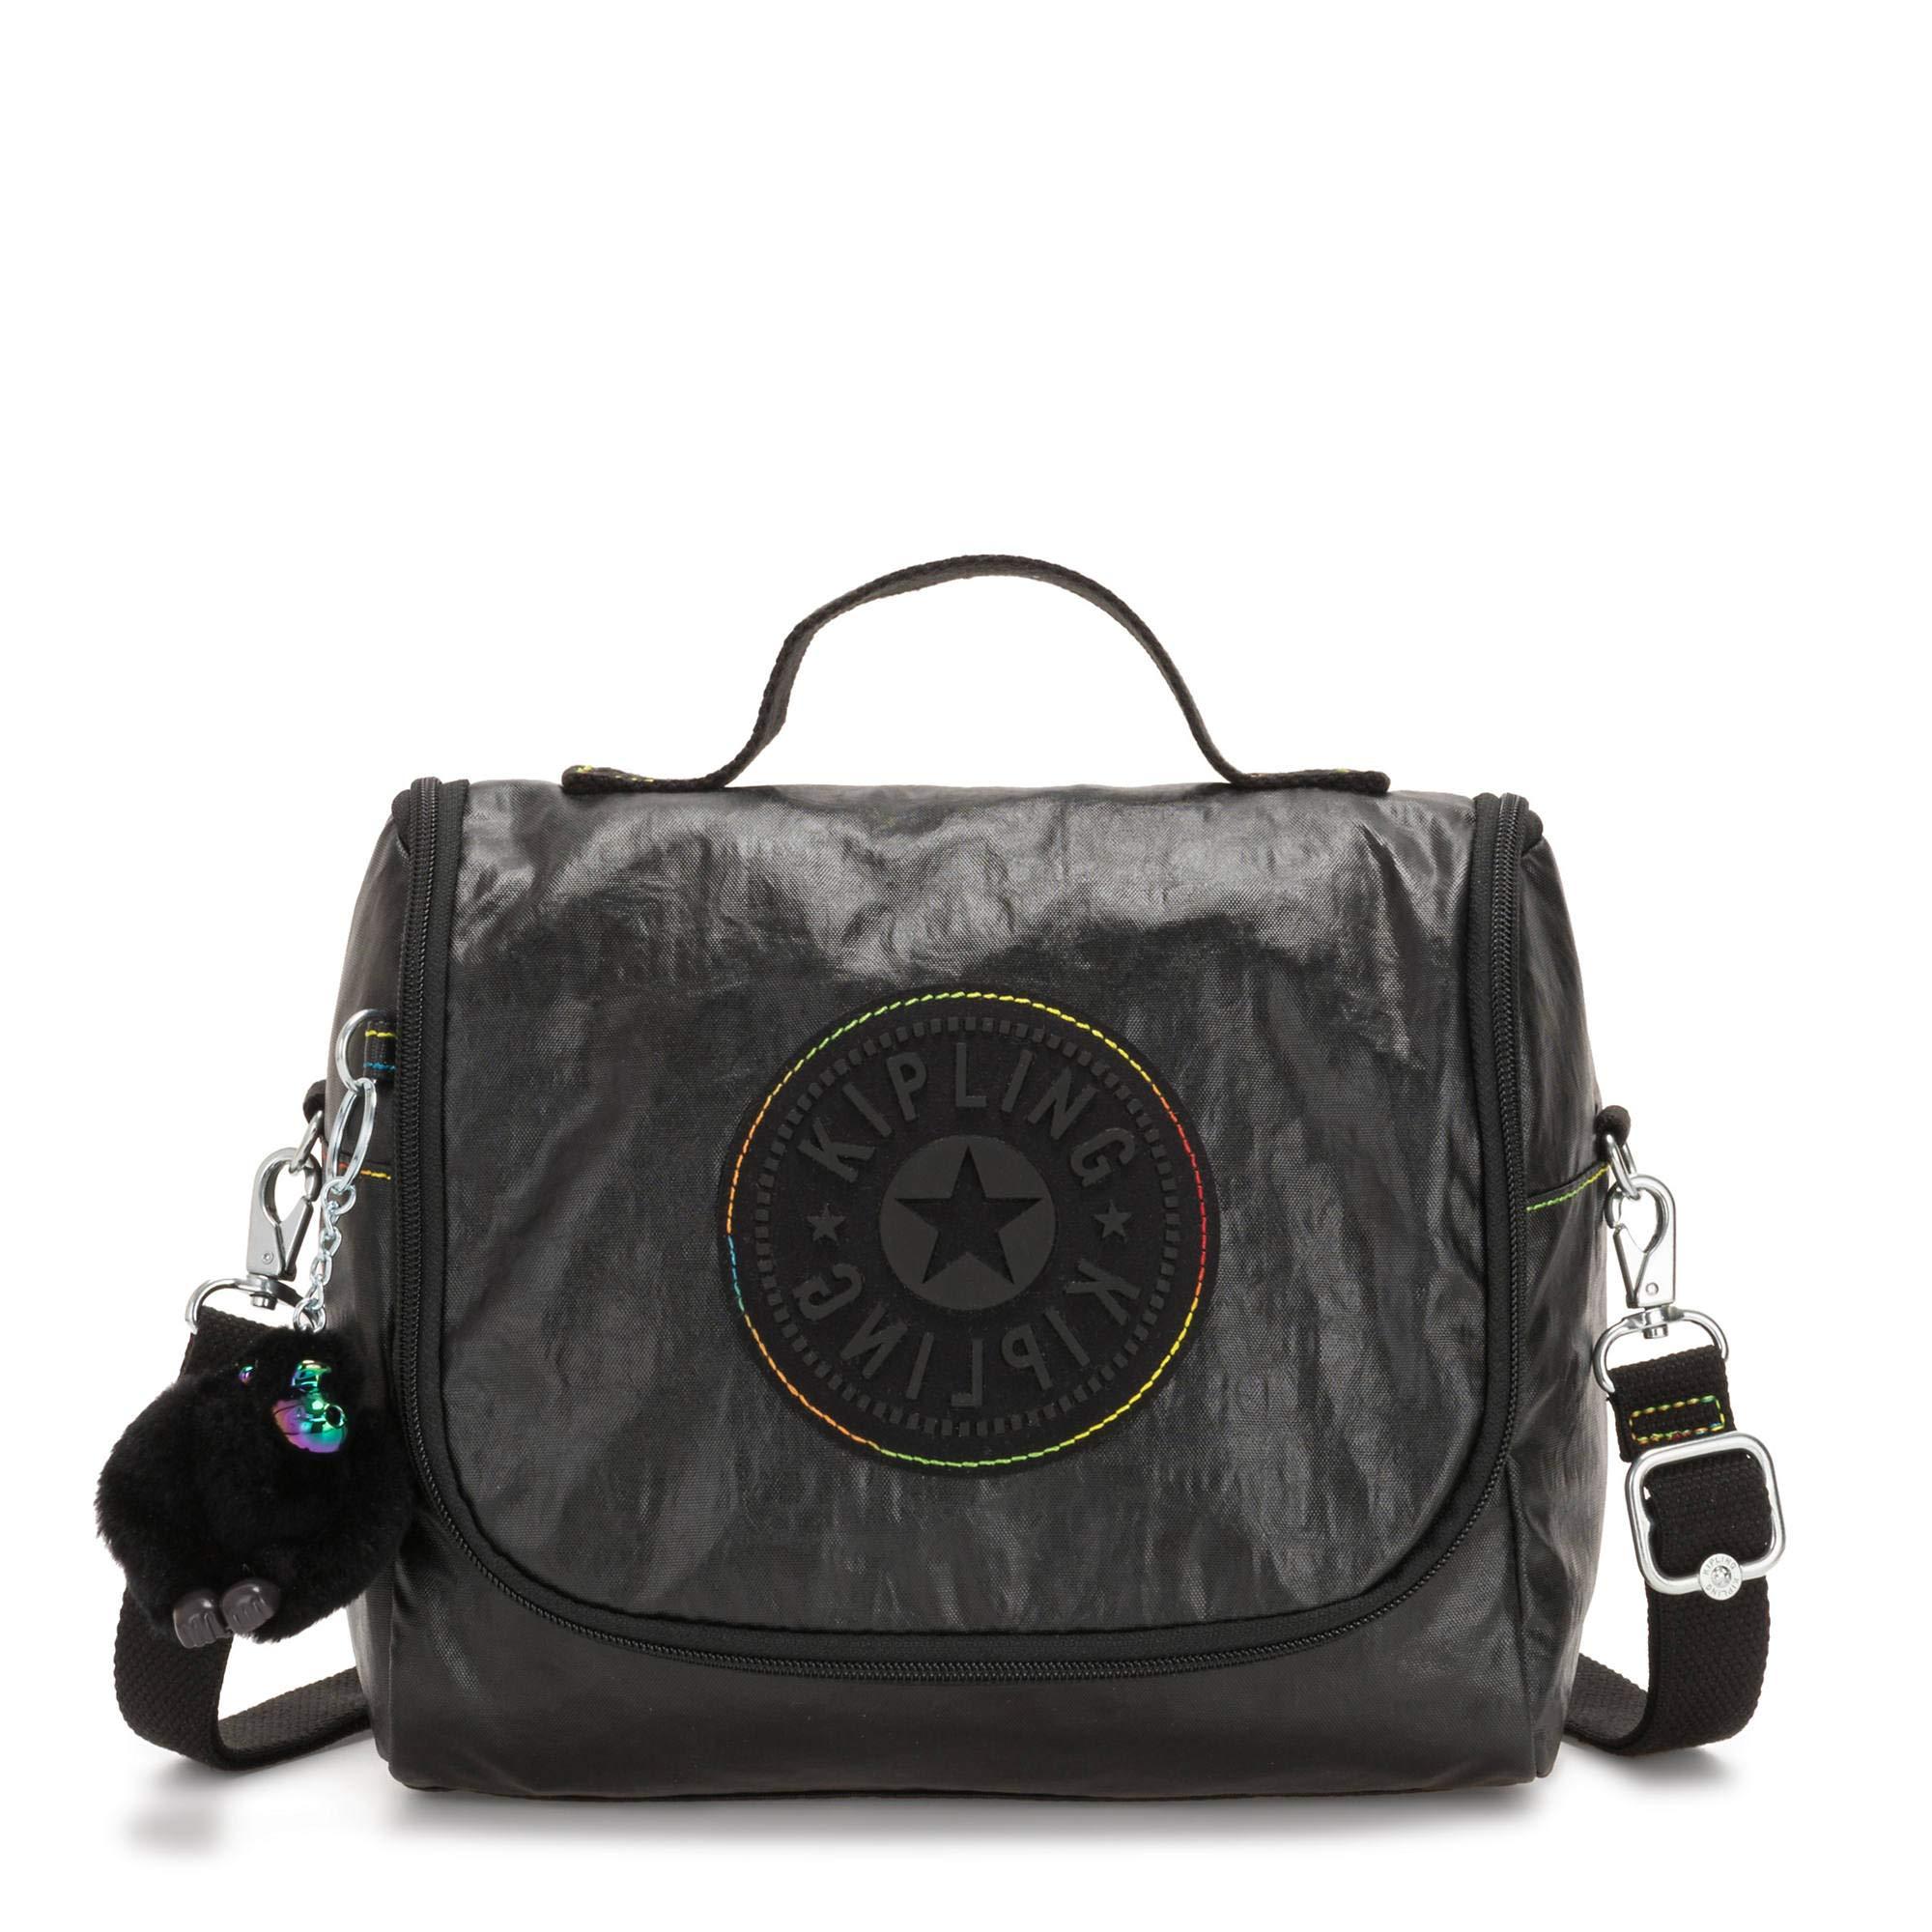 Kipling Kichirou Lunch Bag Black Lacq Glt